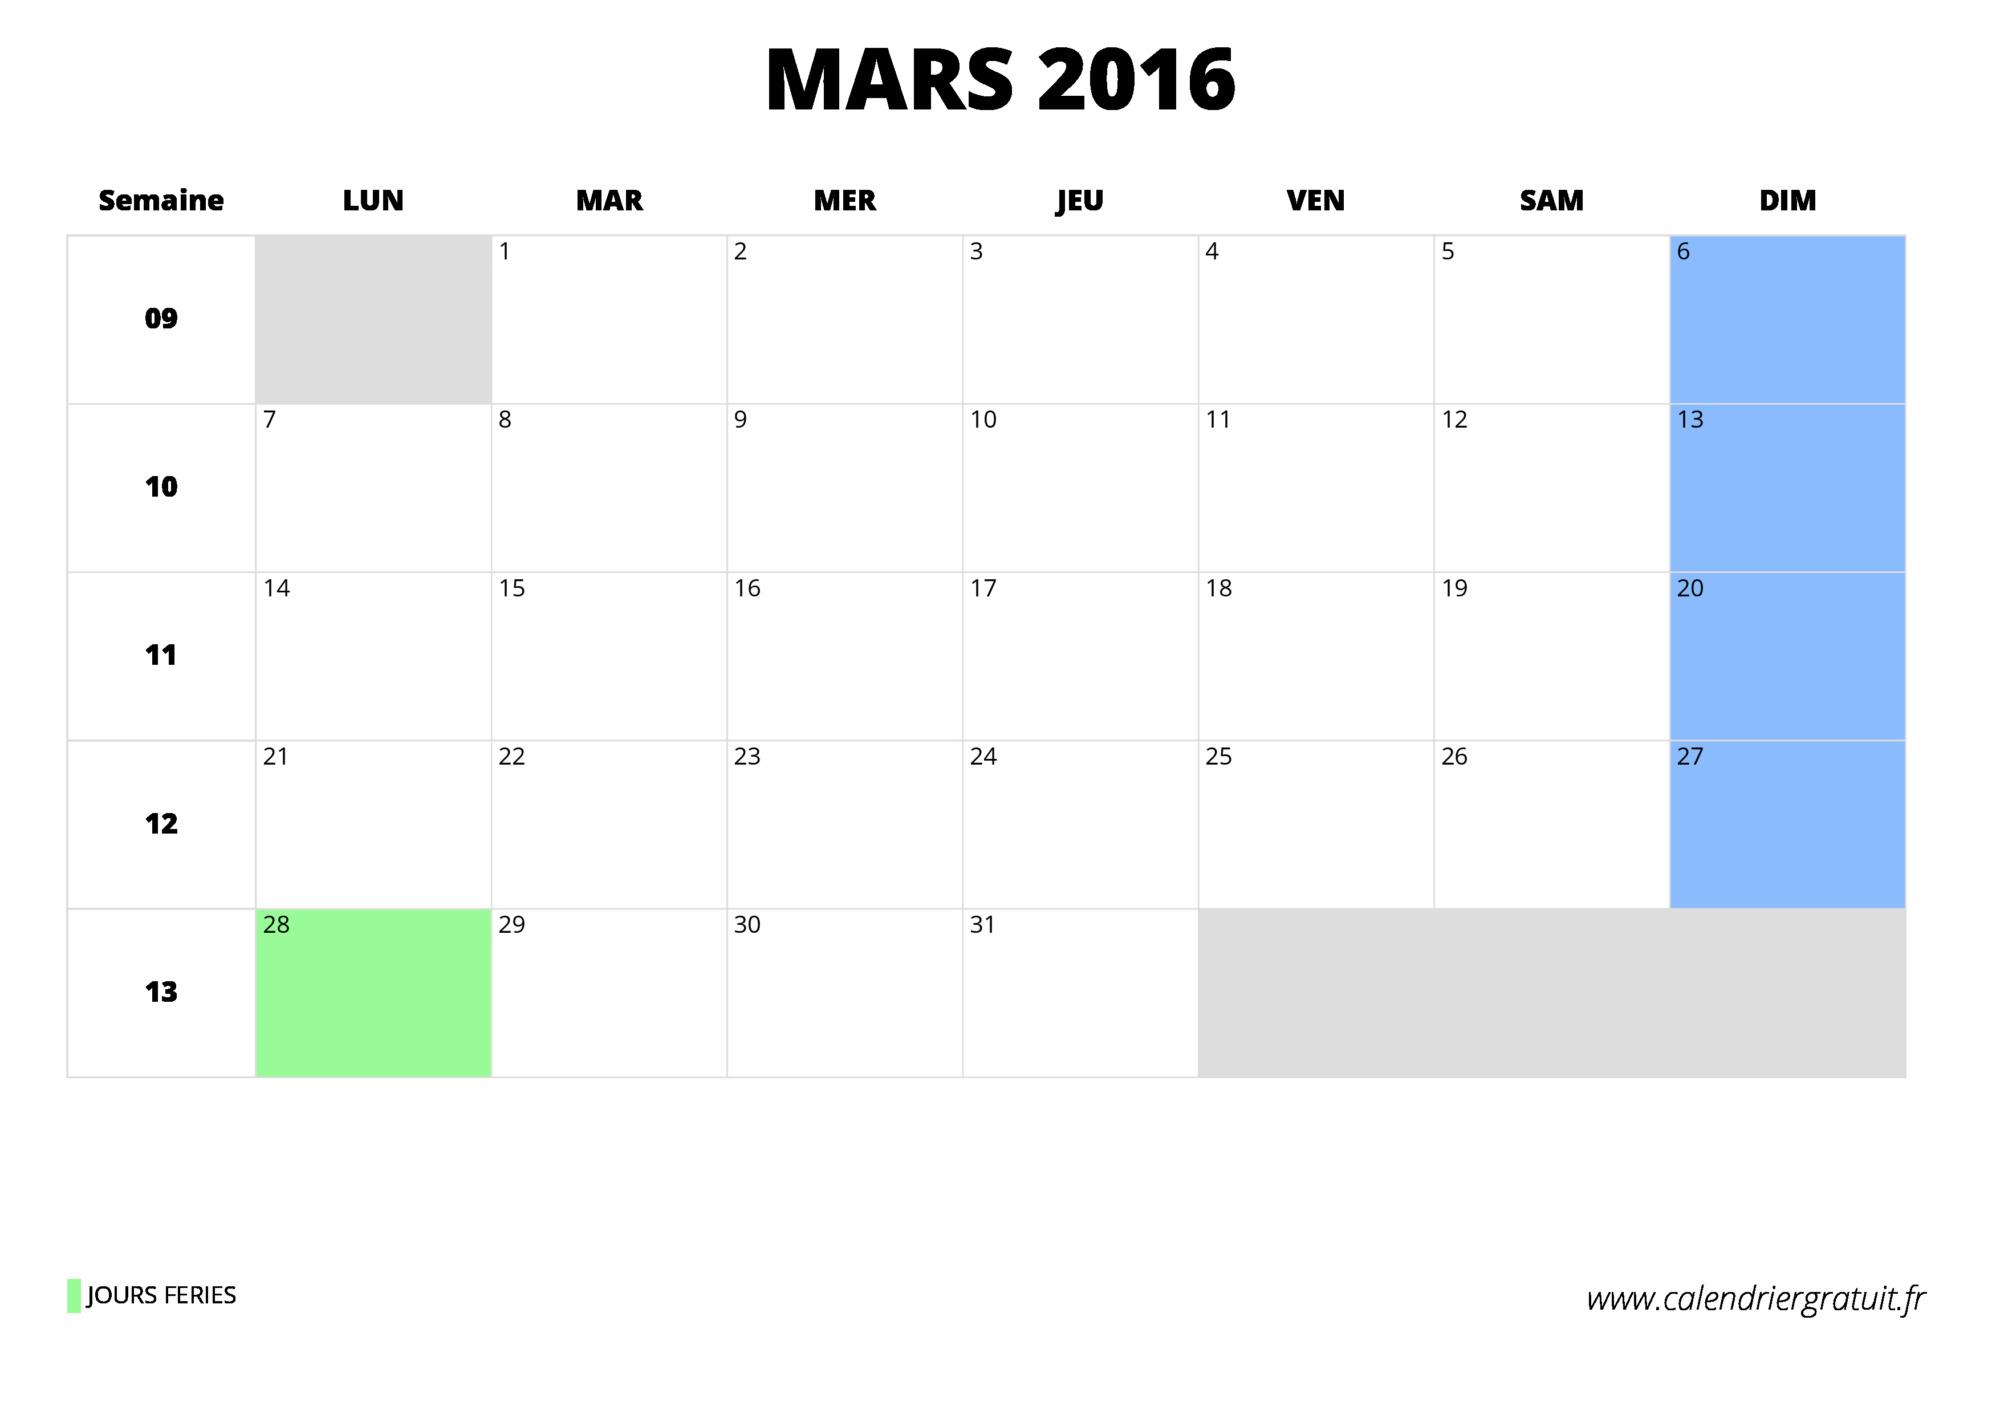 Calendrier mars 2016 imprimer for Calendrier jardin mars 2016